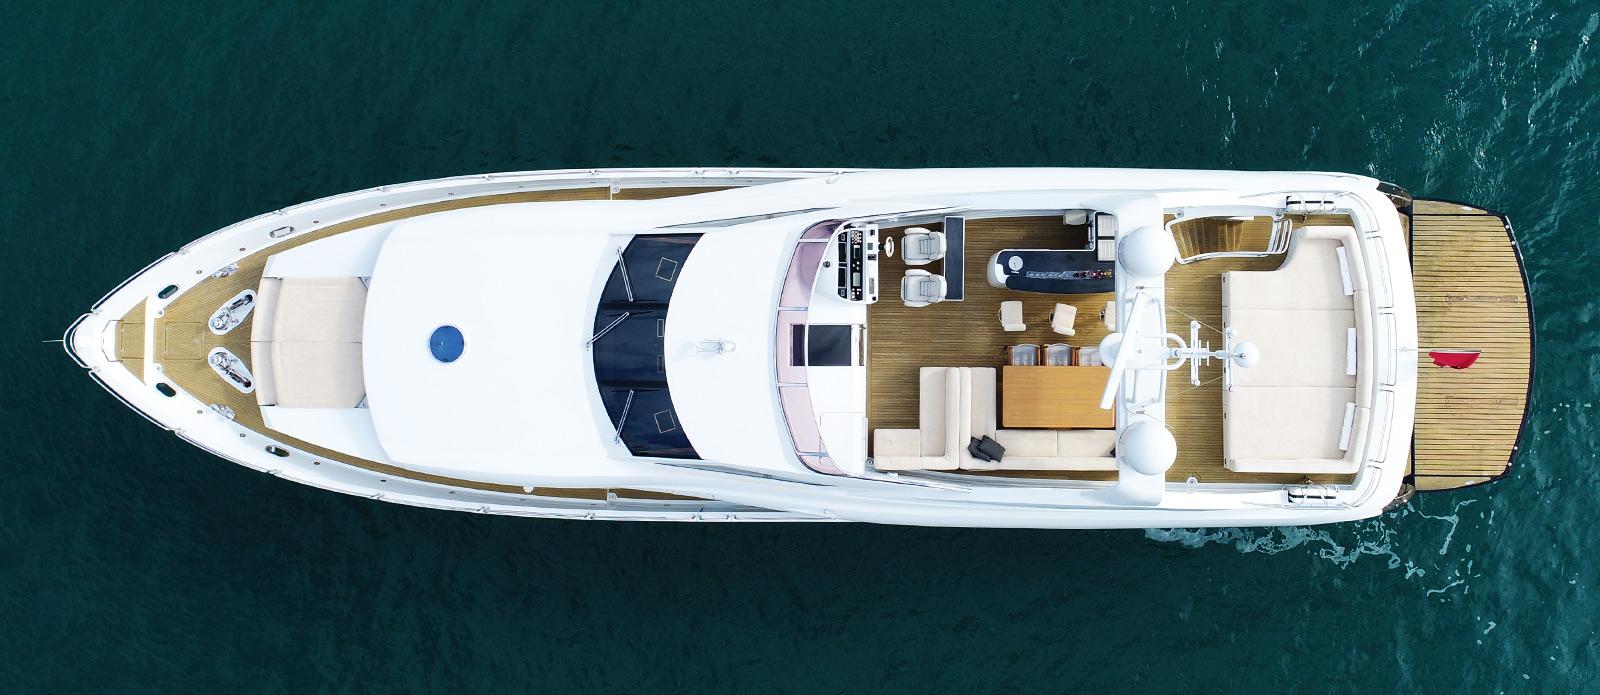 Sunseeker-30-Metre-Yacht-Coraysa-Overhead